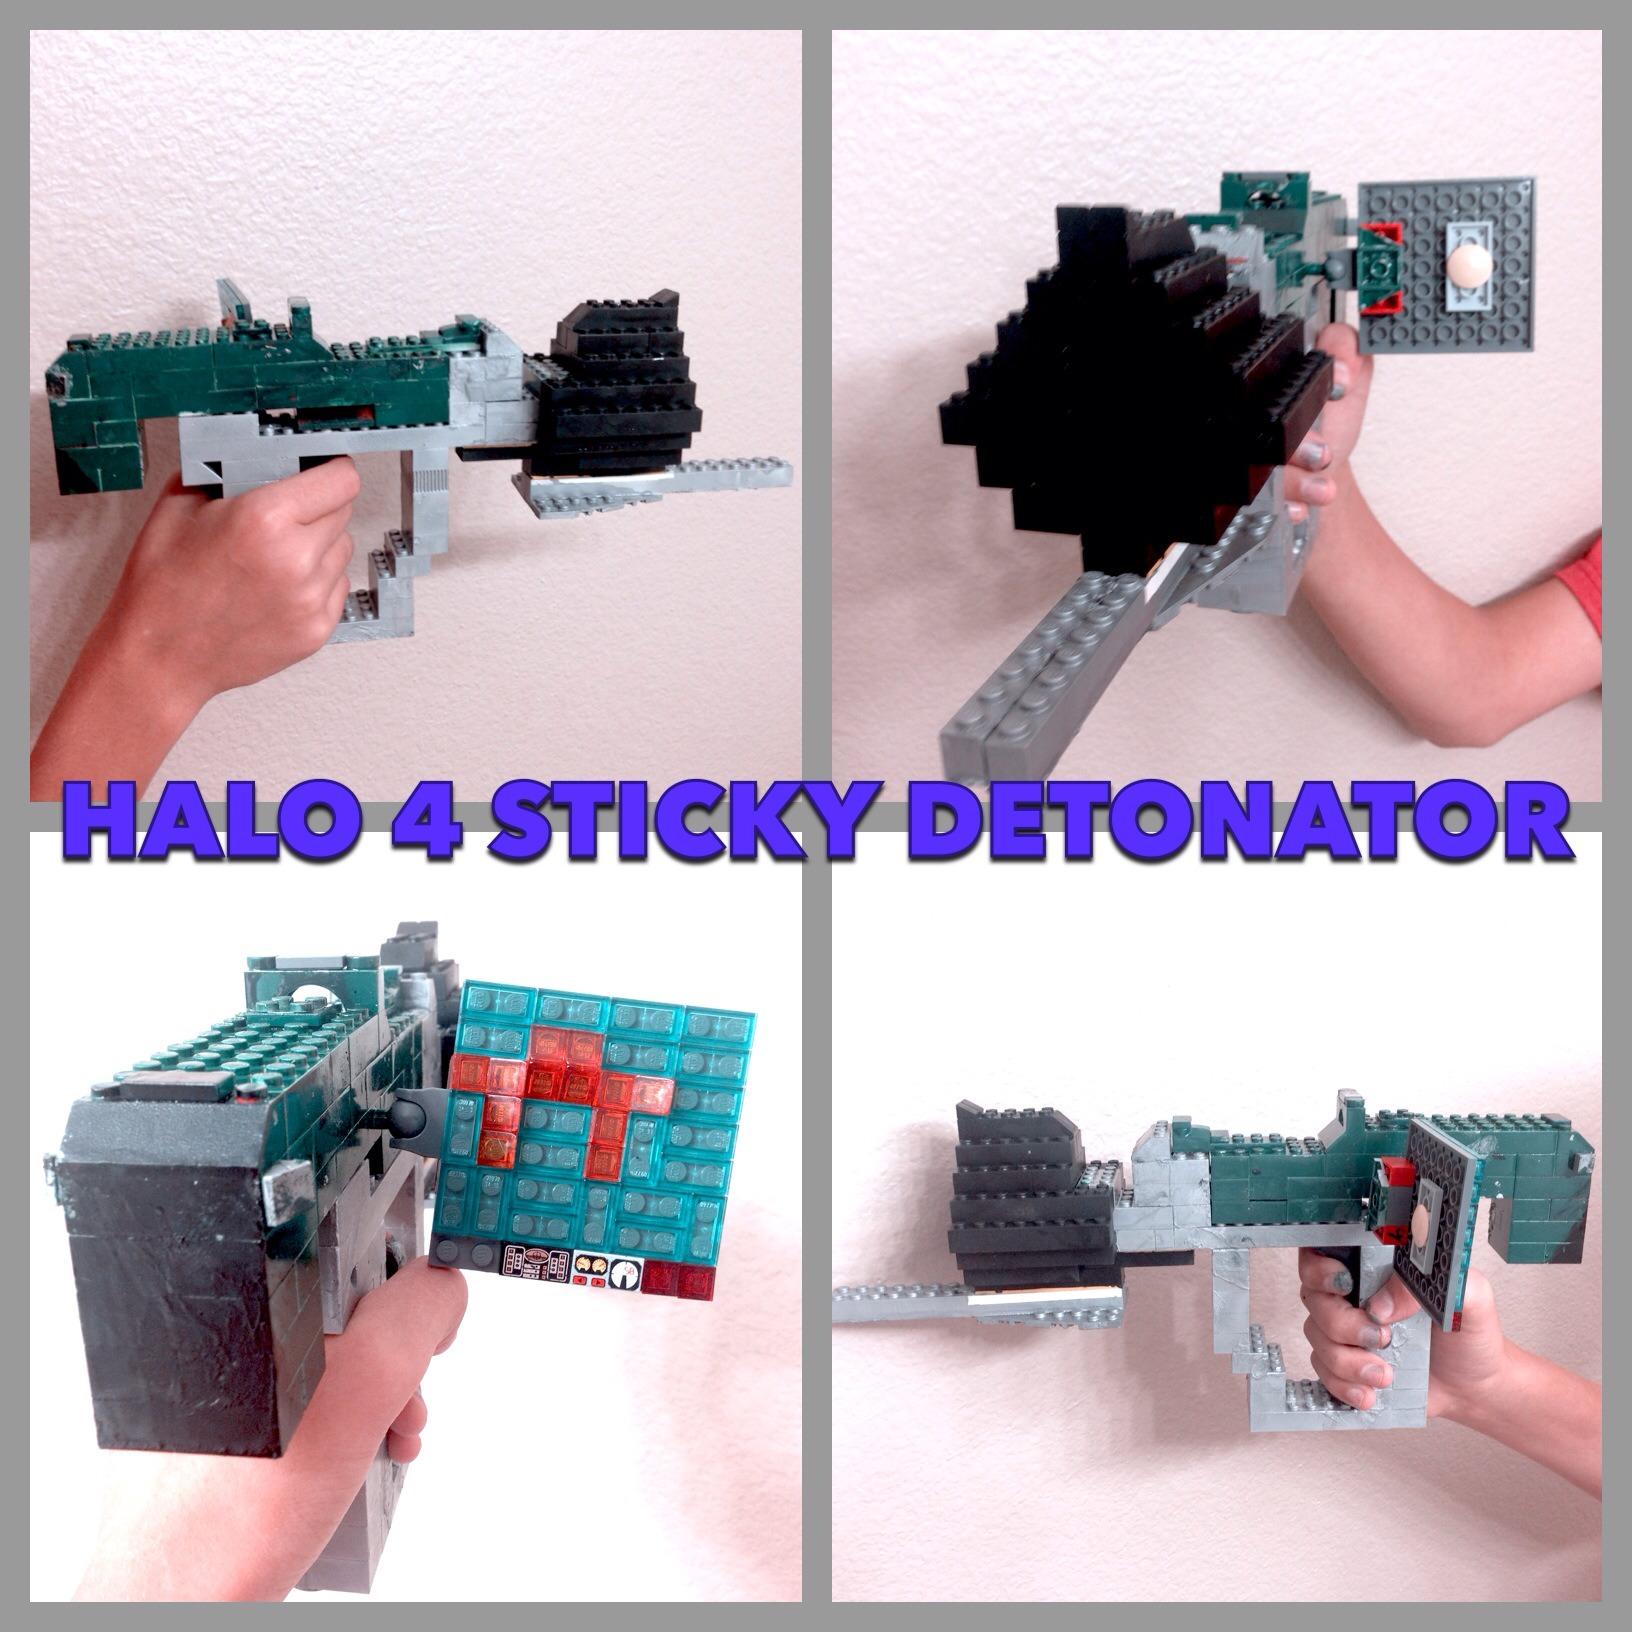 Halo 4 Sticky Detonator!